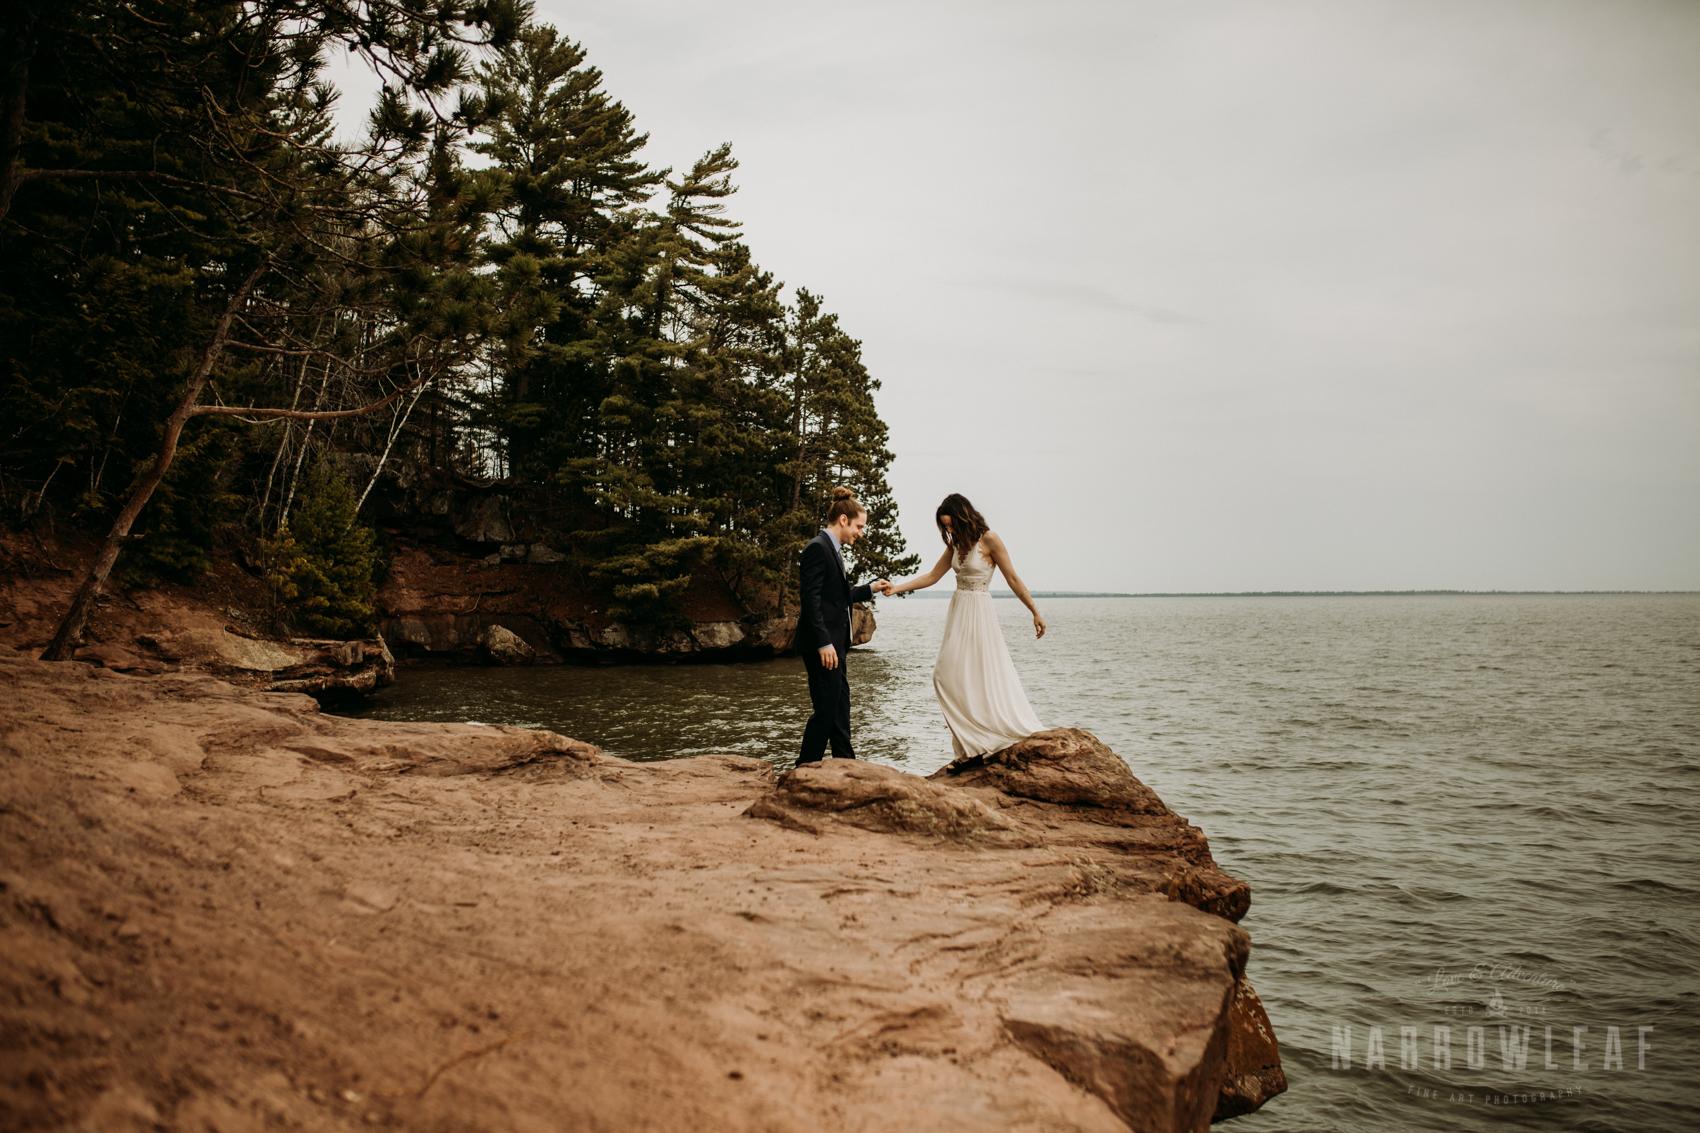 moody-lake-superior-hiking-adventure-elopement-NarrowLeaf-Photography-7260.jpg